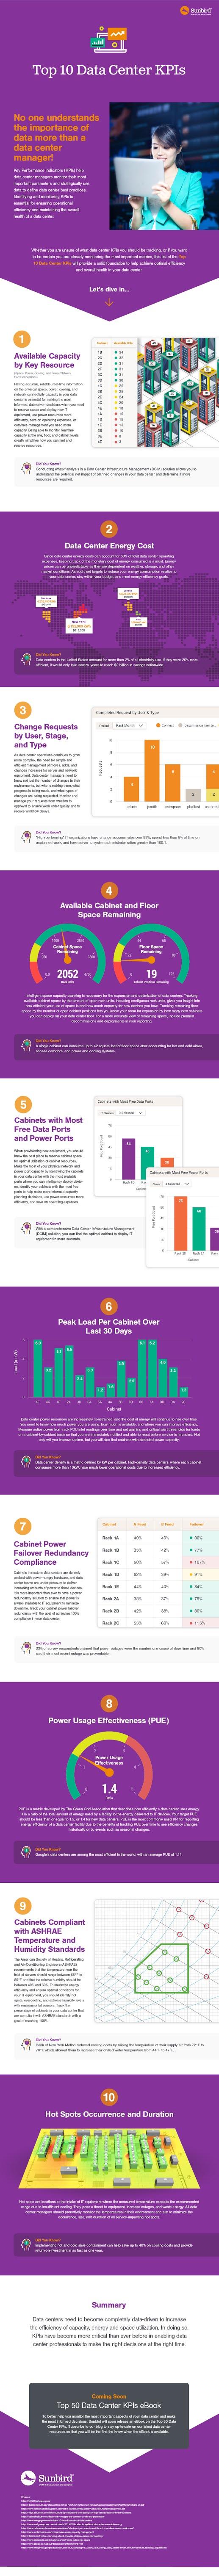 Top 10 Data Center KPIs #Infographic